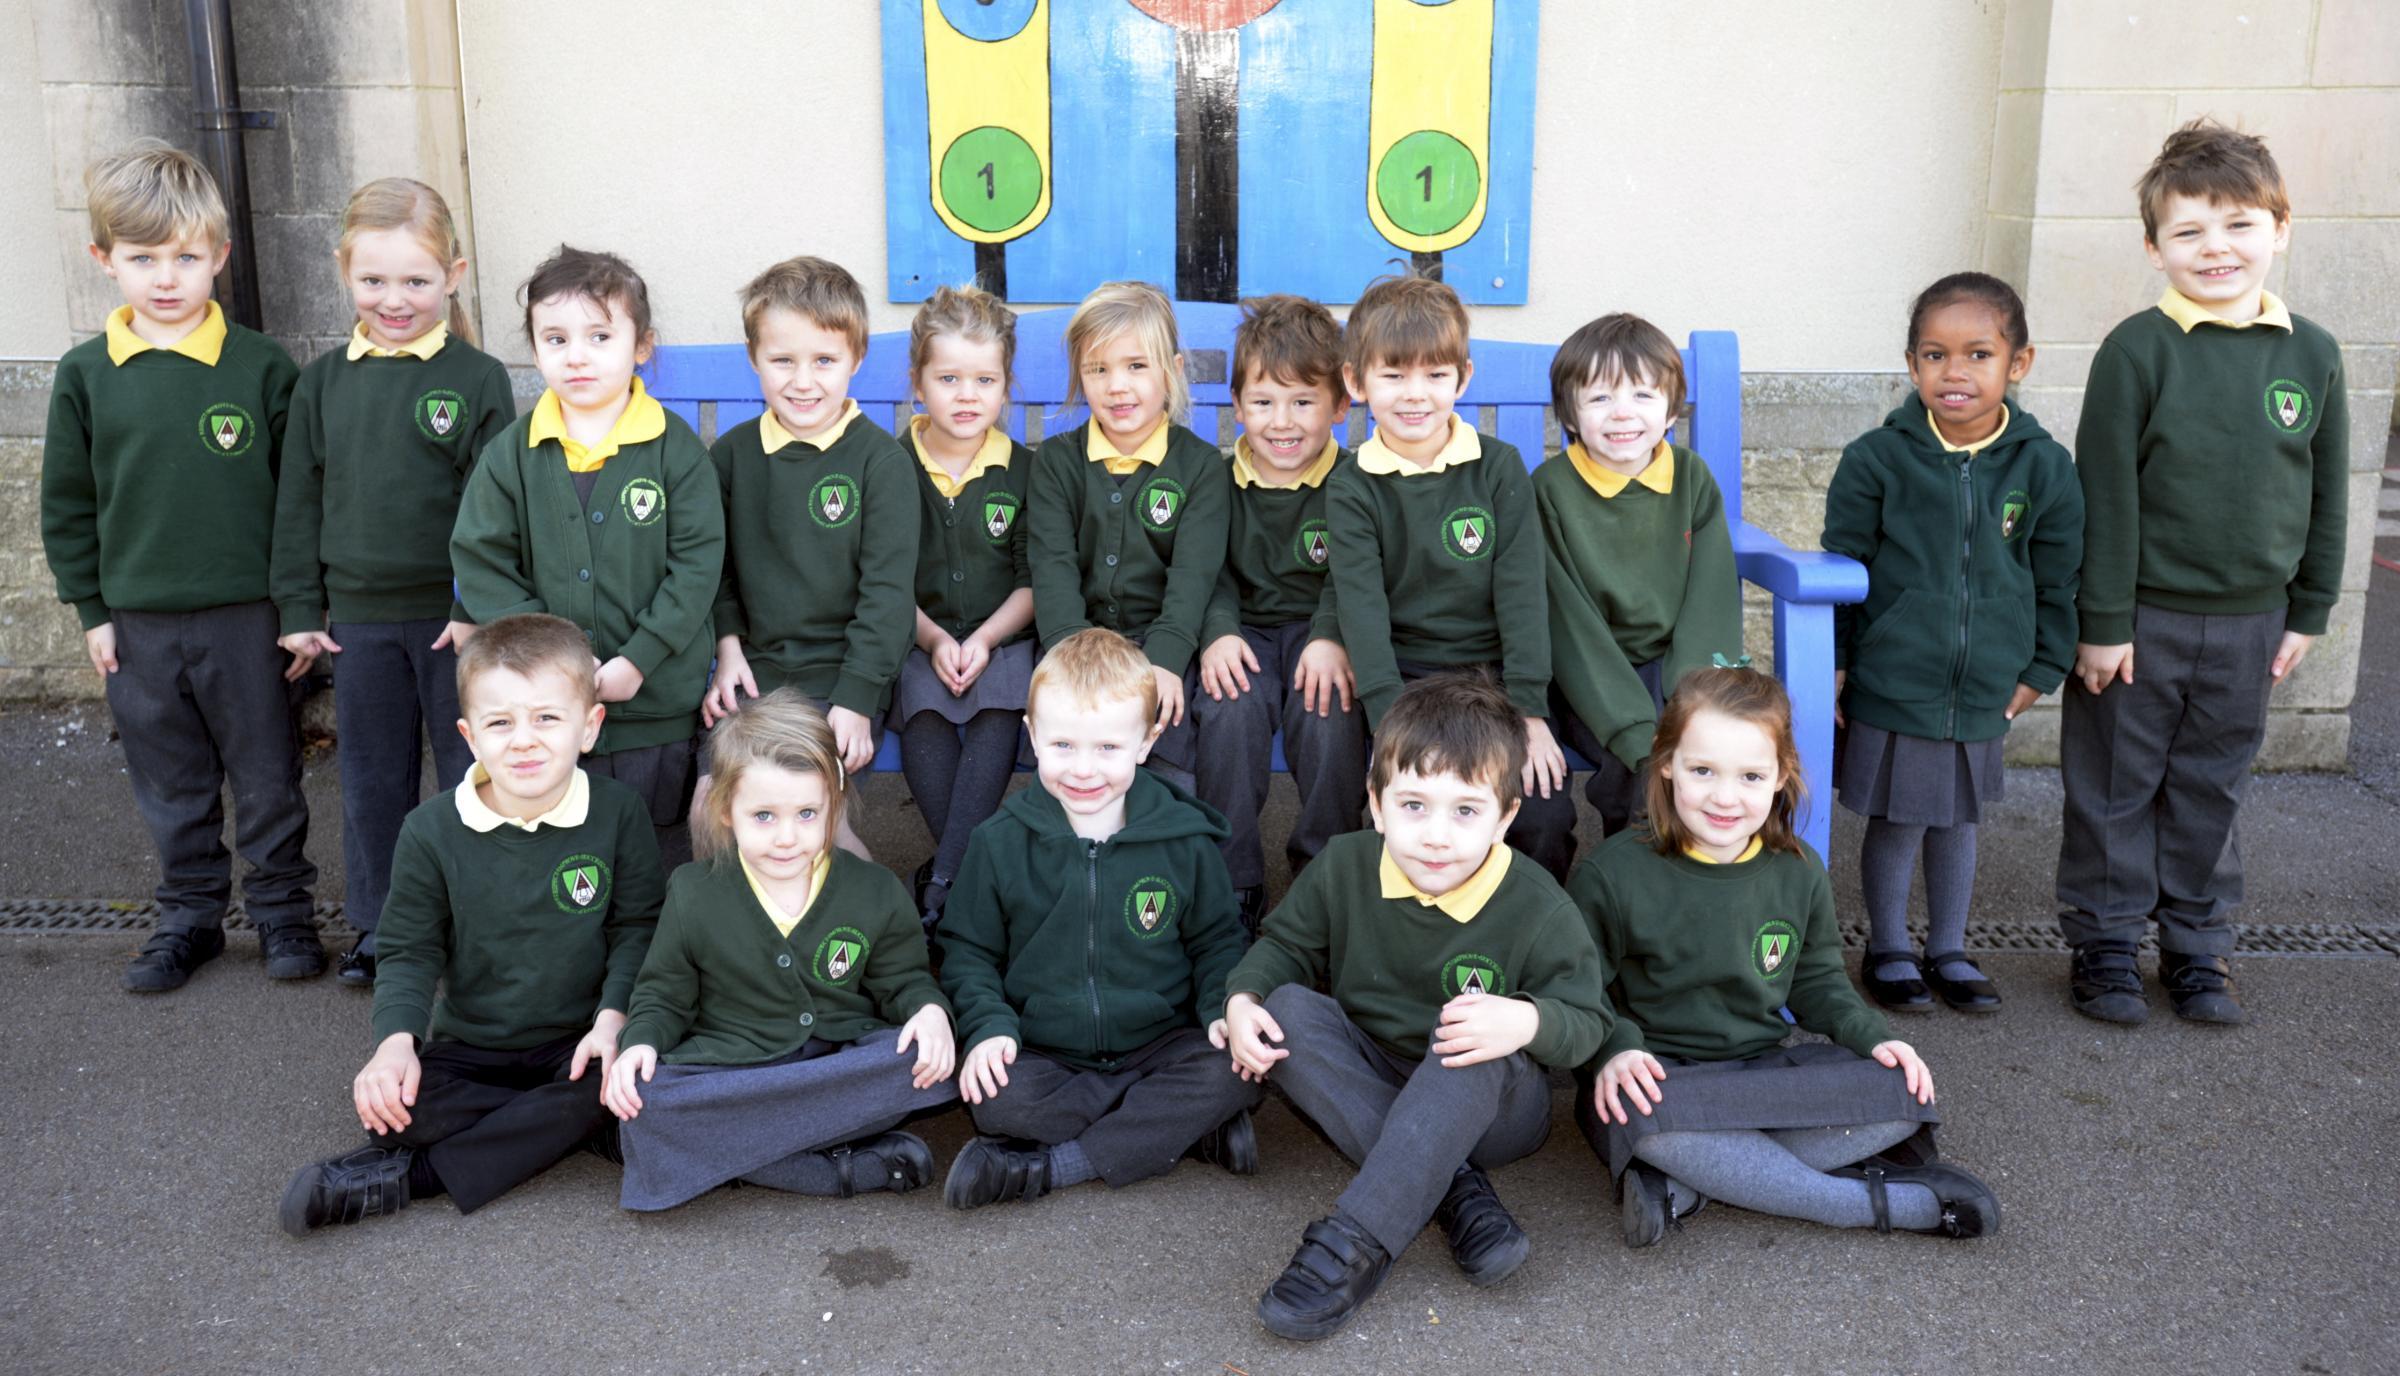 Kempsford C of E Primary School Reception Class Photos